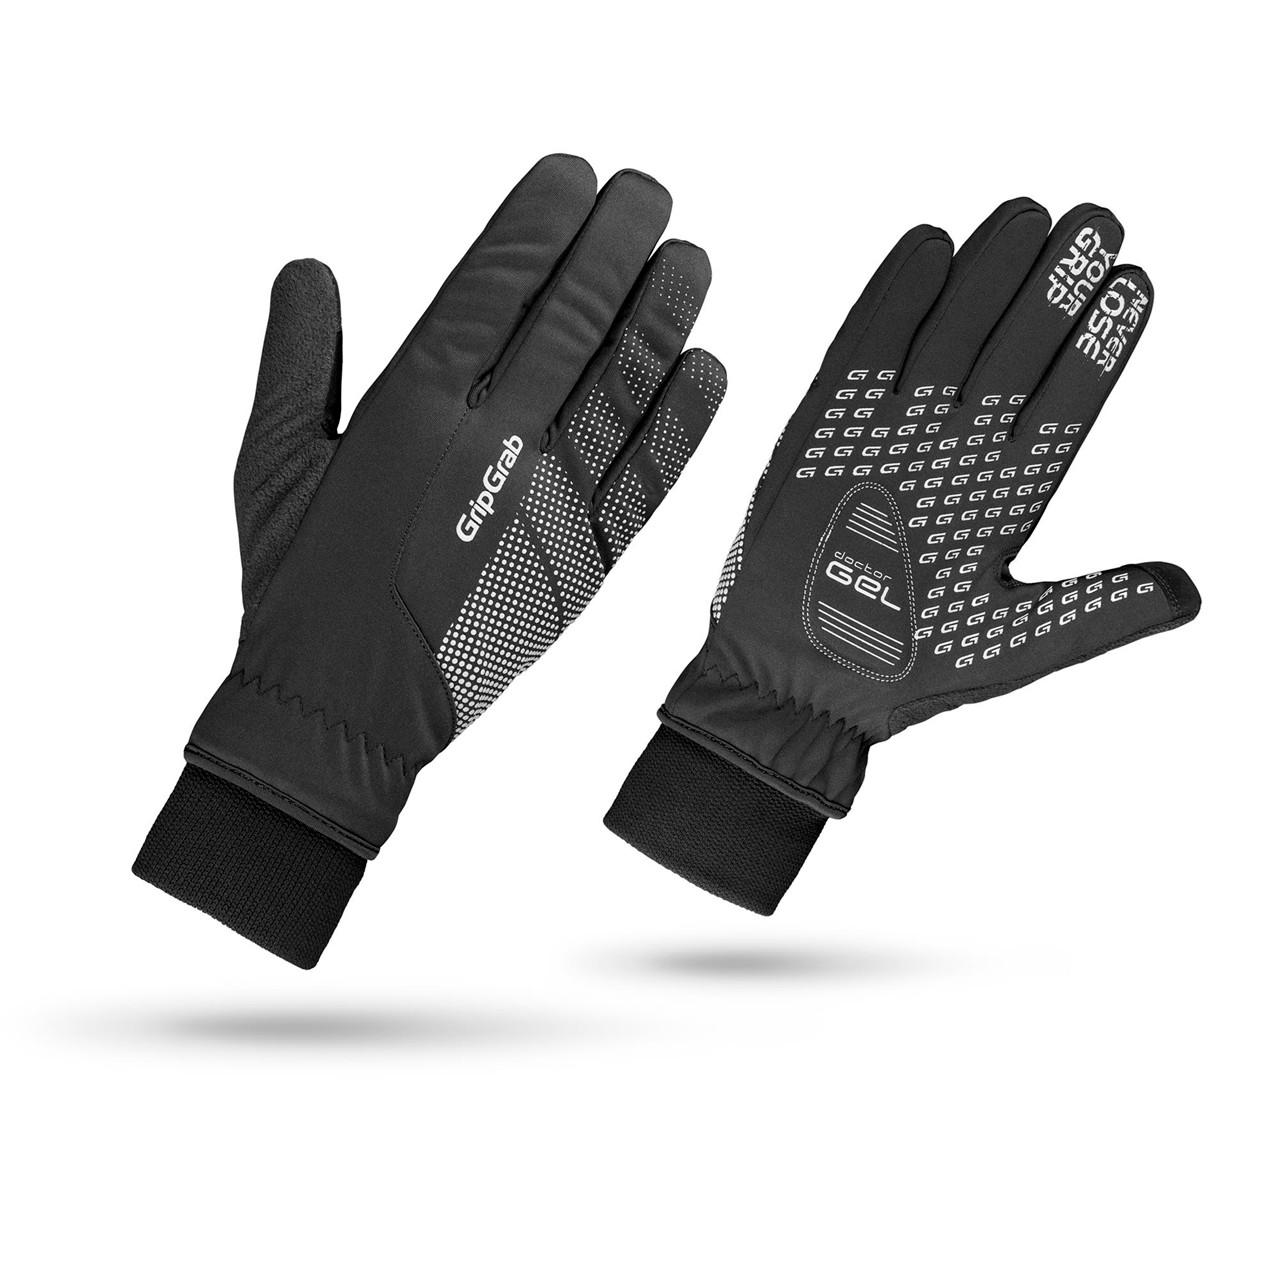 Cykler Grip Grab Ride Winter Glove (Sort, Xxl) Cykel Tilbehør